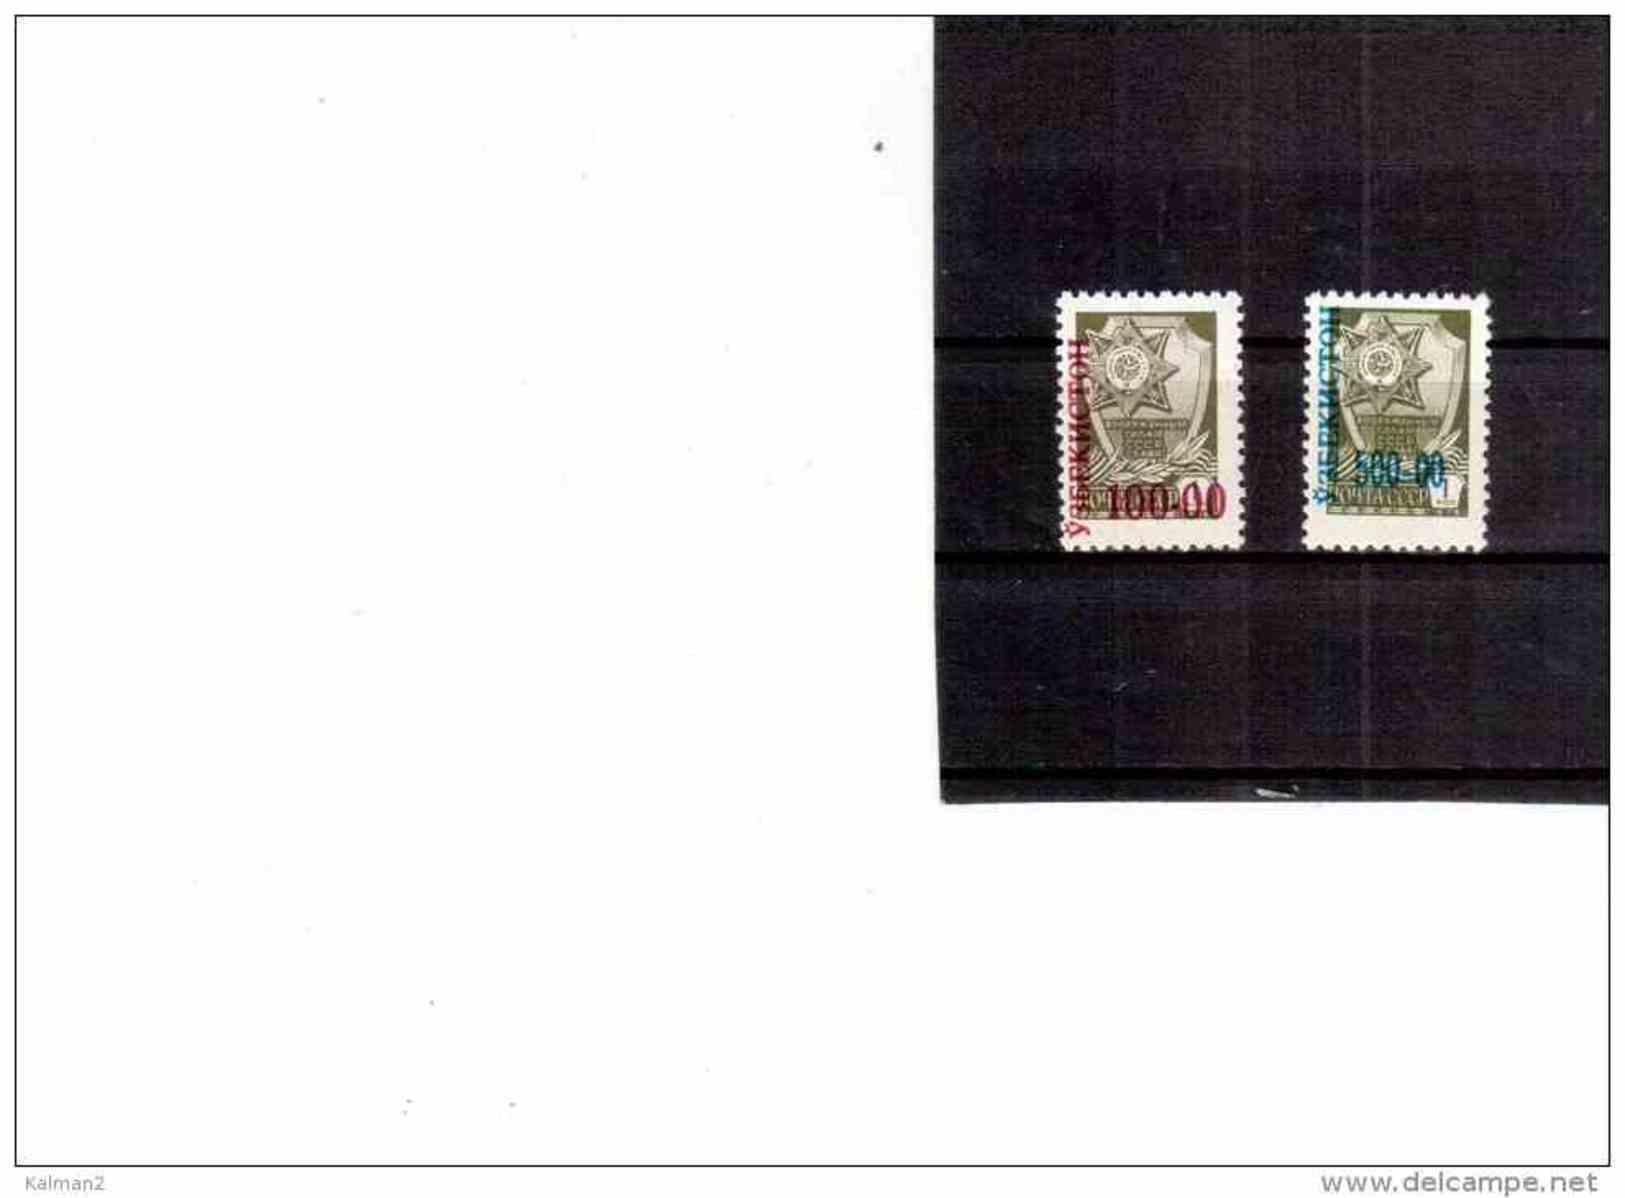 XX1471   -  UZBEKISTAN   -   SERIE ORDINARIA  RUSSIA SOPRASTAMPATI ** MNH  /  CAT.UNIFICATO NR. 24/25 - Uzbekistan